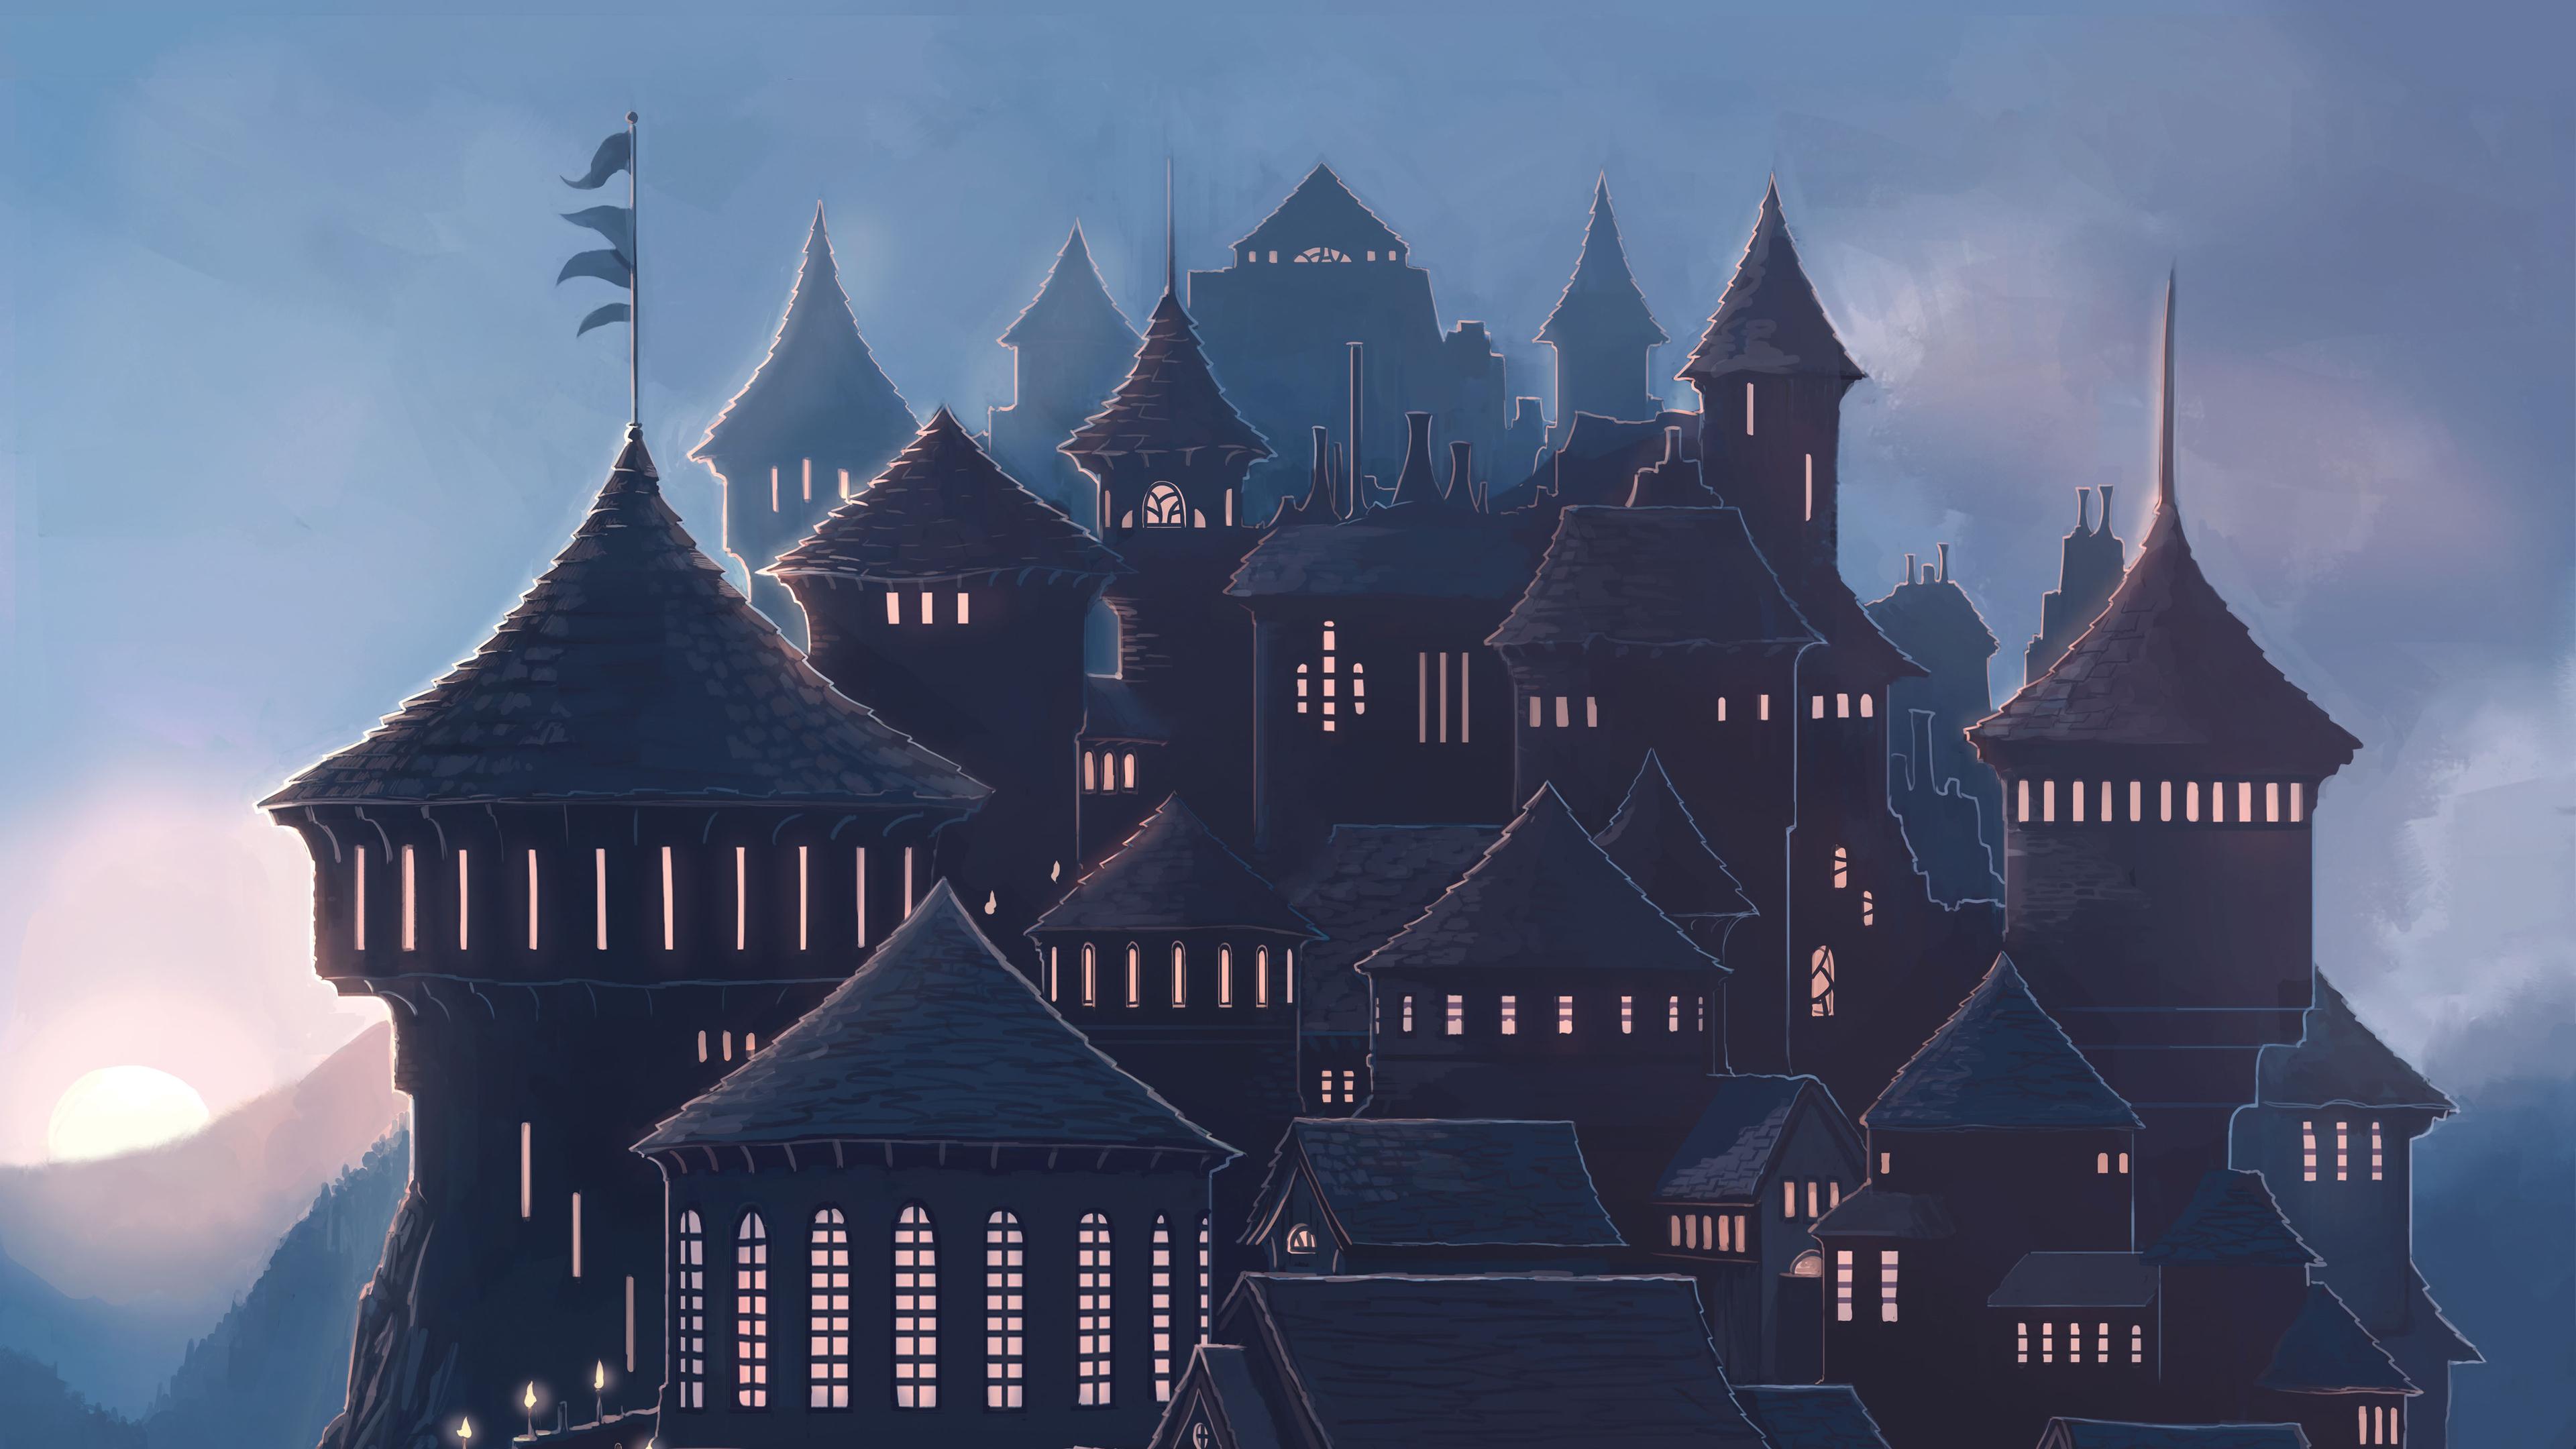 Wallpaper 4k Hogwarts Harry Potter School 4k 4k Wallpapers